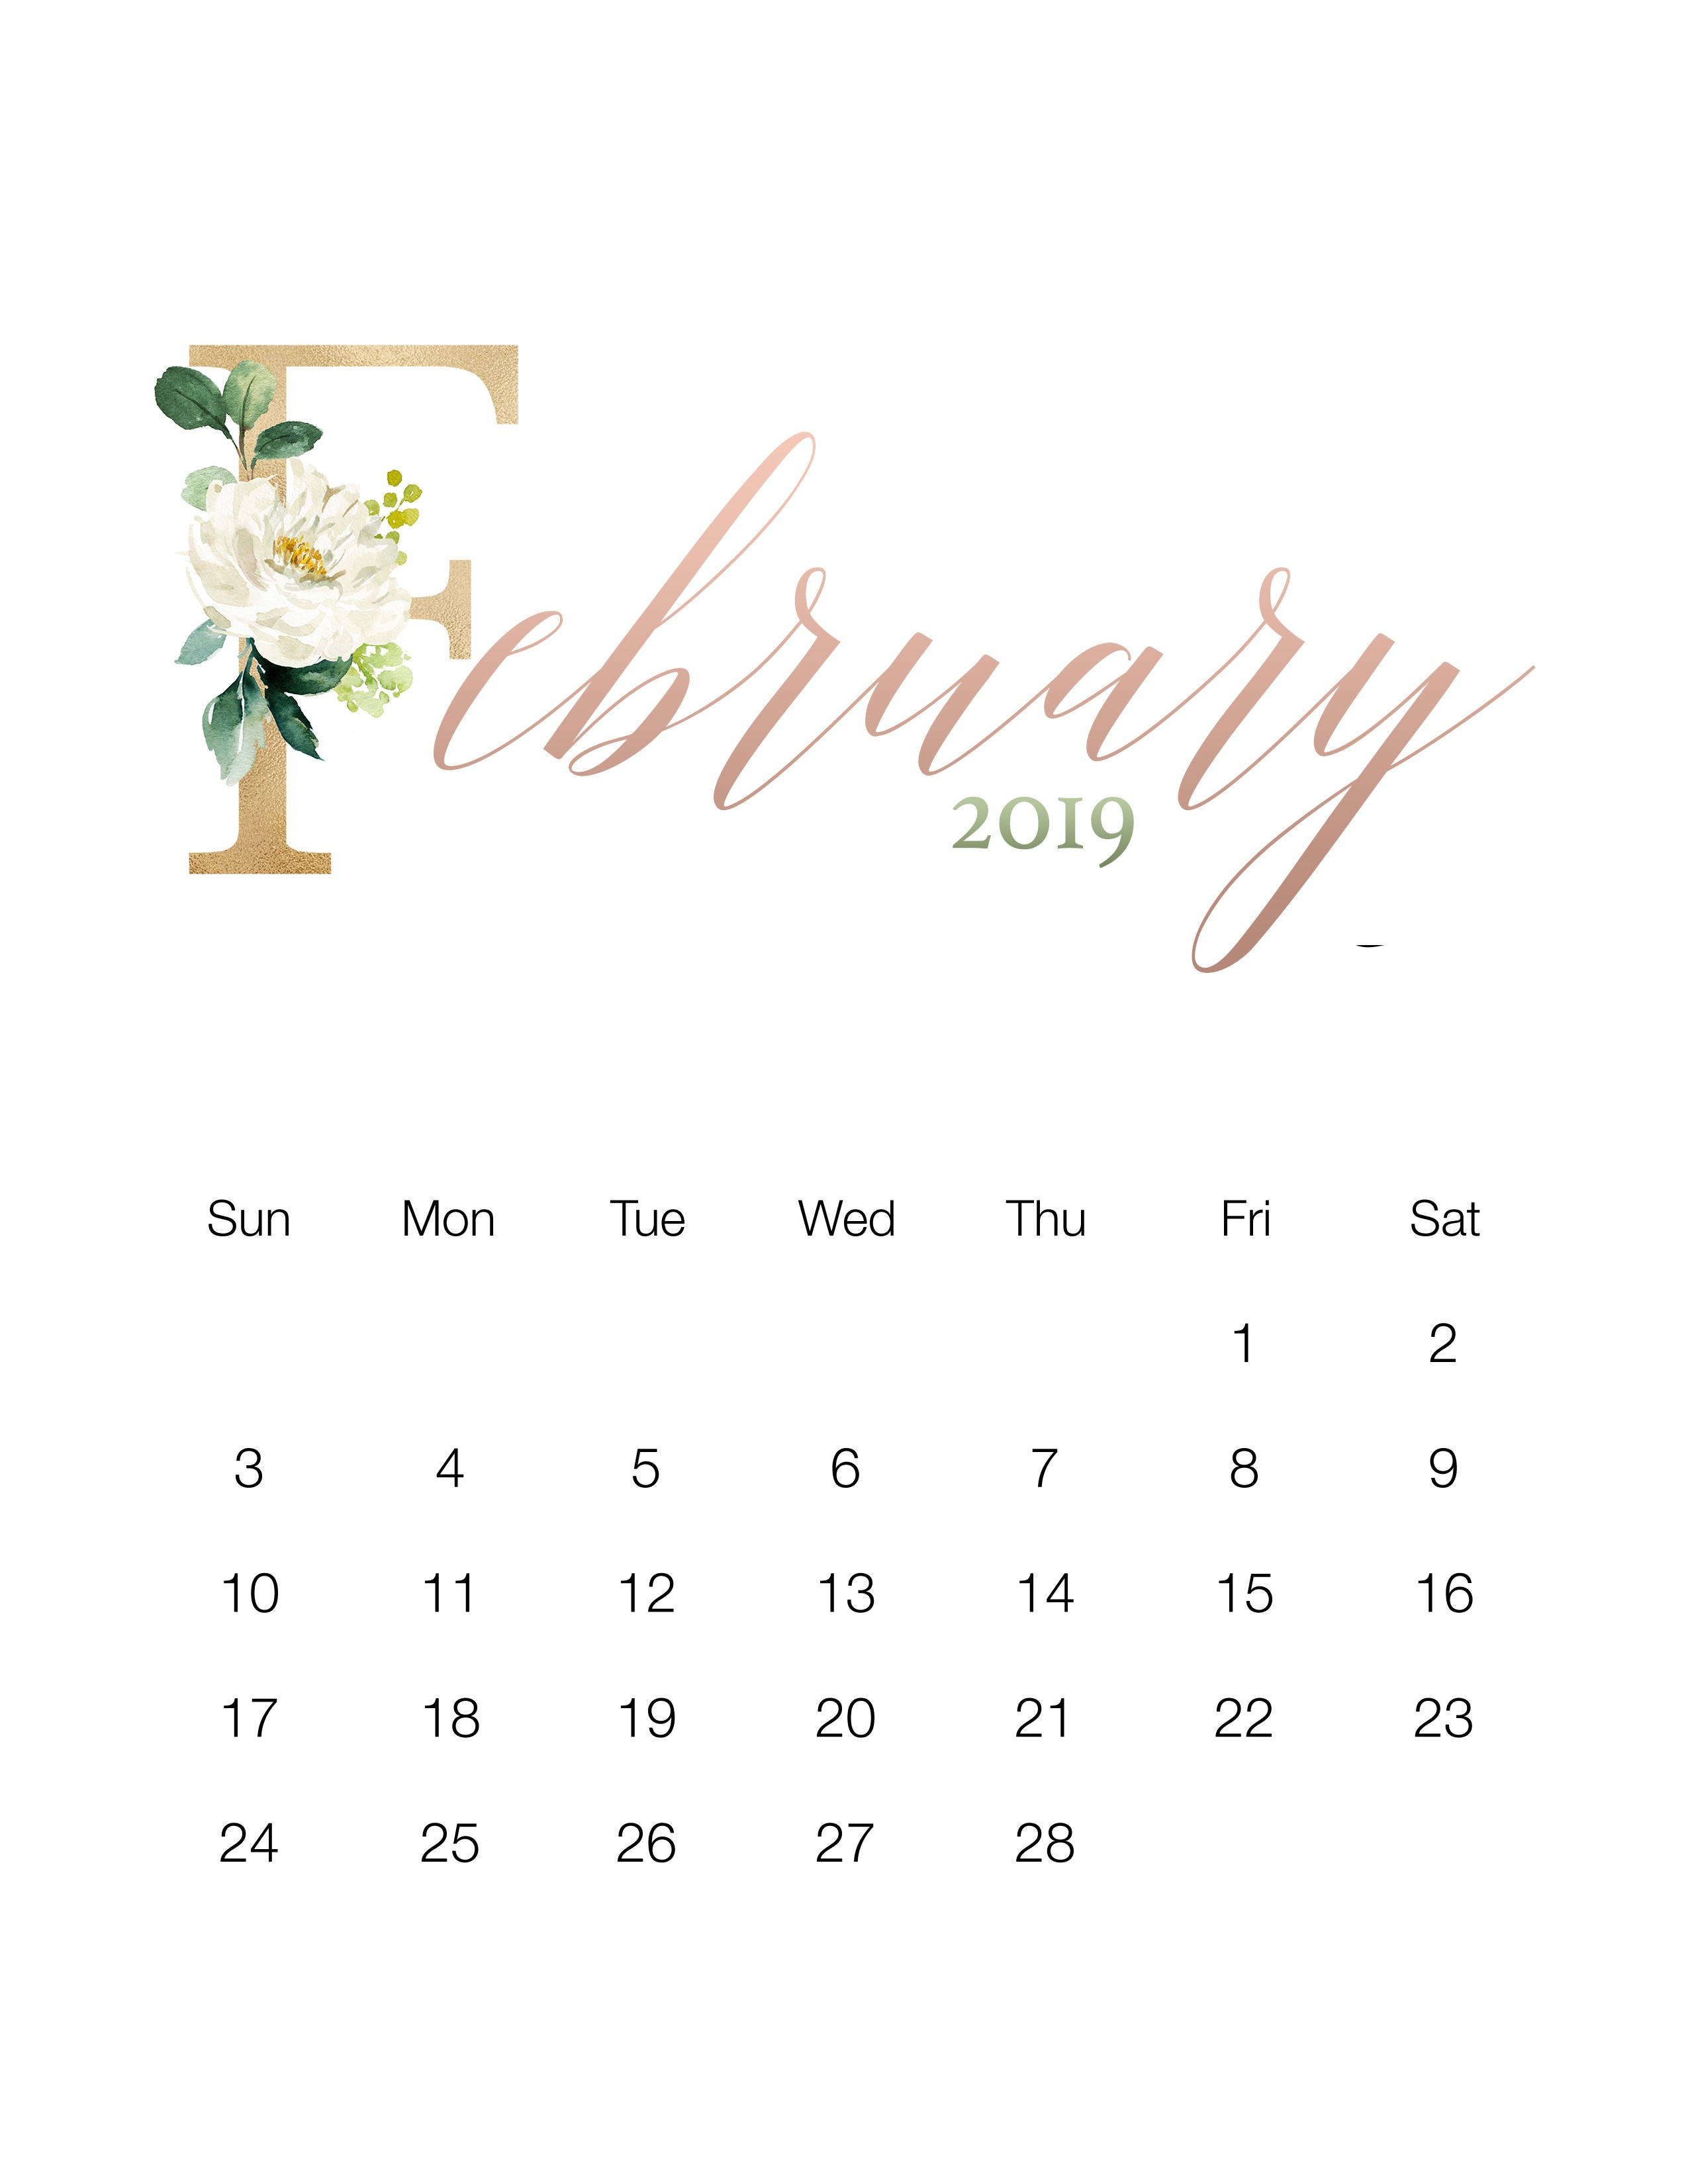 March Calendar 2019 Actual Pretty Floral Free Printable 2019 Calendar the Cottage Market Of March Calendar 2019 Mejores Y Más Novedosos 30 Day Calendar Template Awesome Calendar 1 April 2018 to 31 March